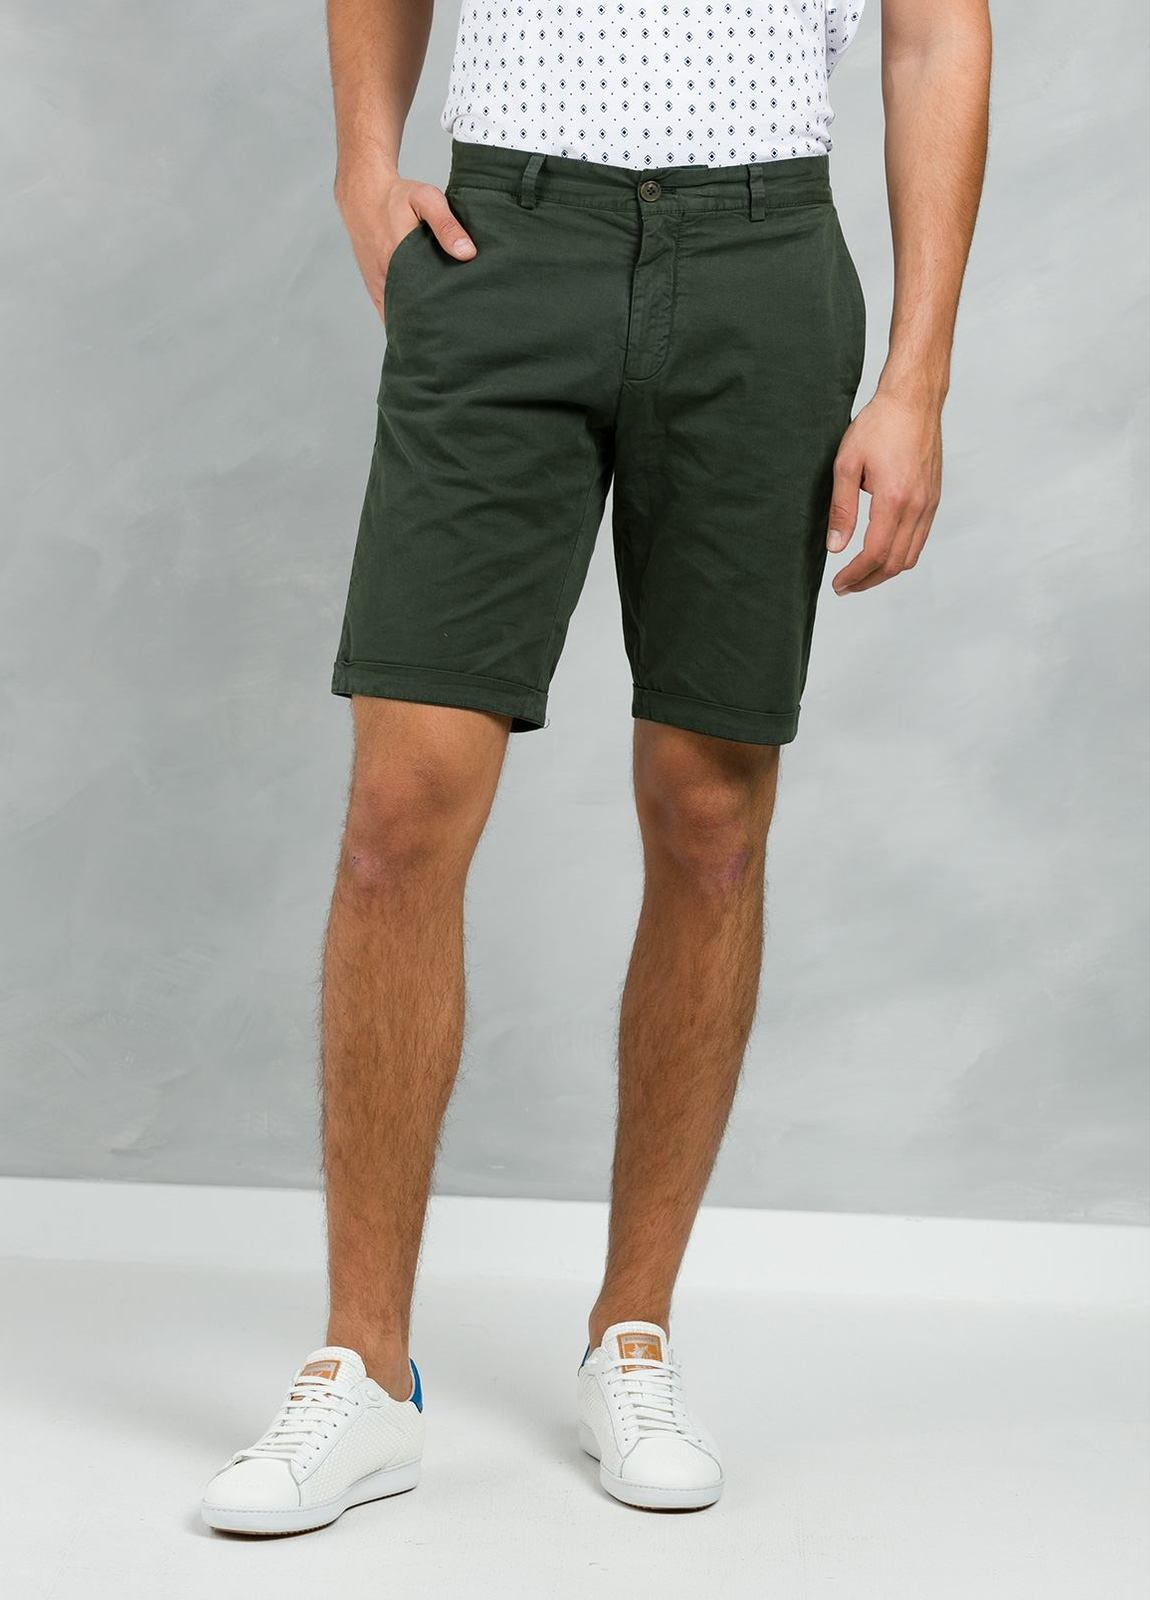 Bermuda ligeramente slim fit color kaki, 100% Algodón.